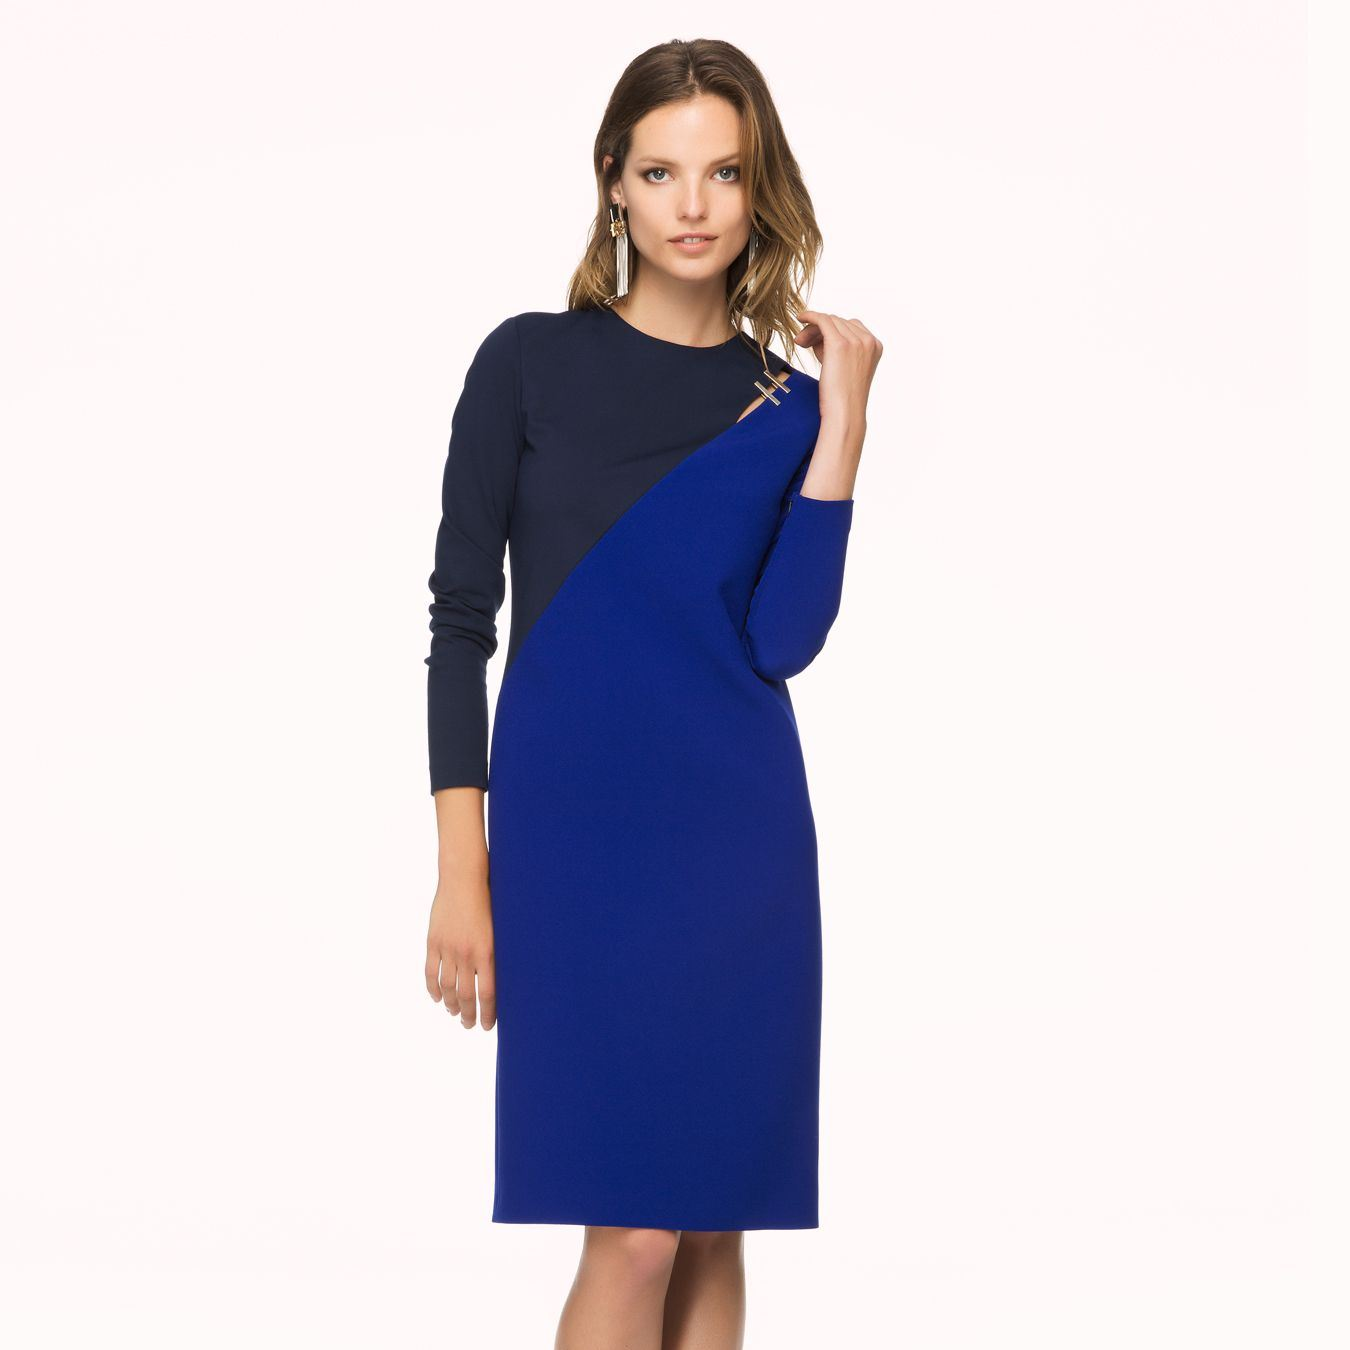 Saks Mavisi Midi Elbise Modeli